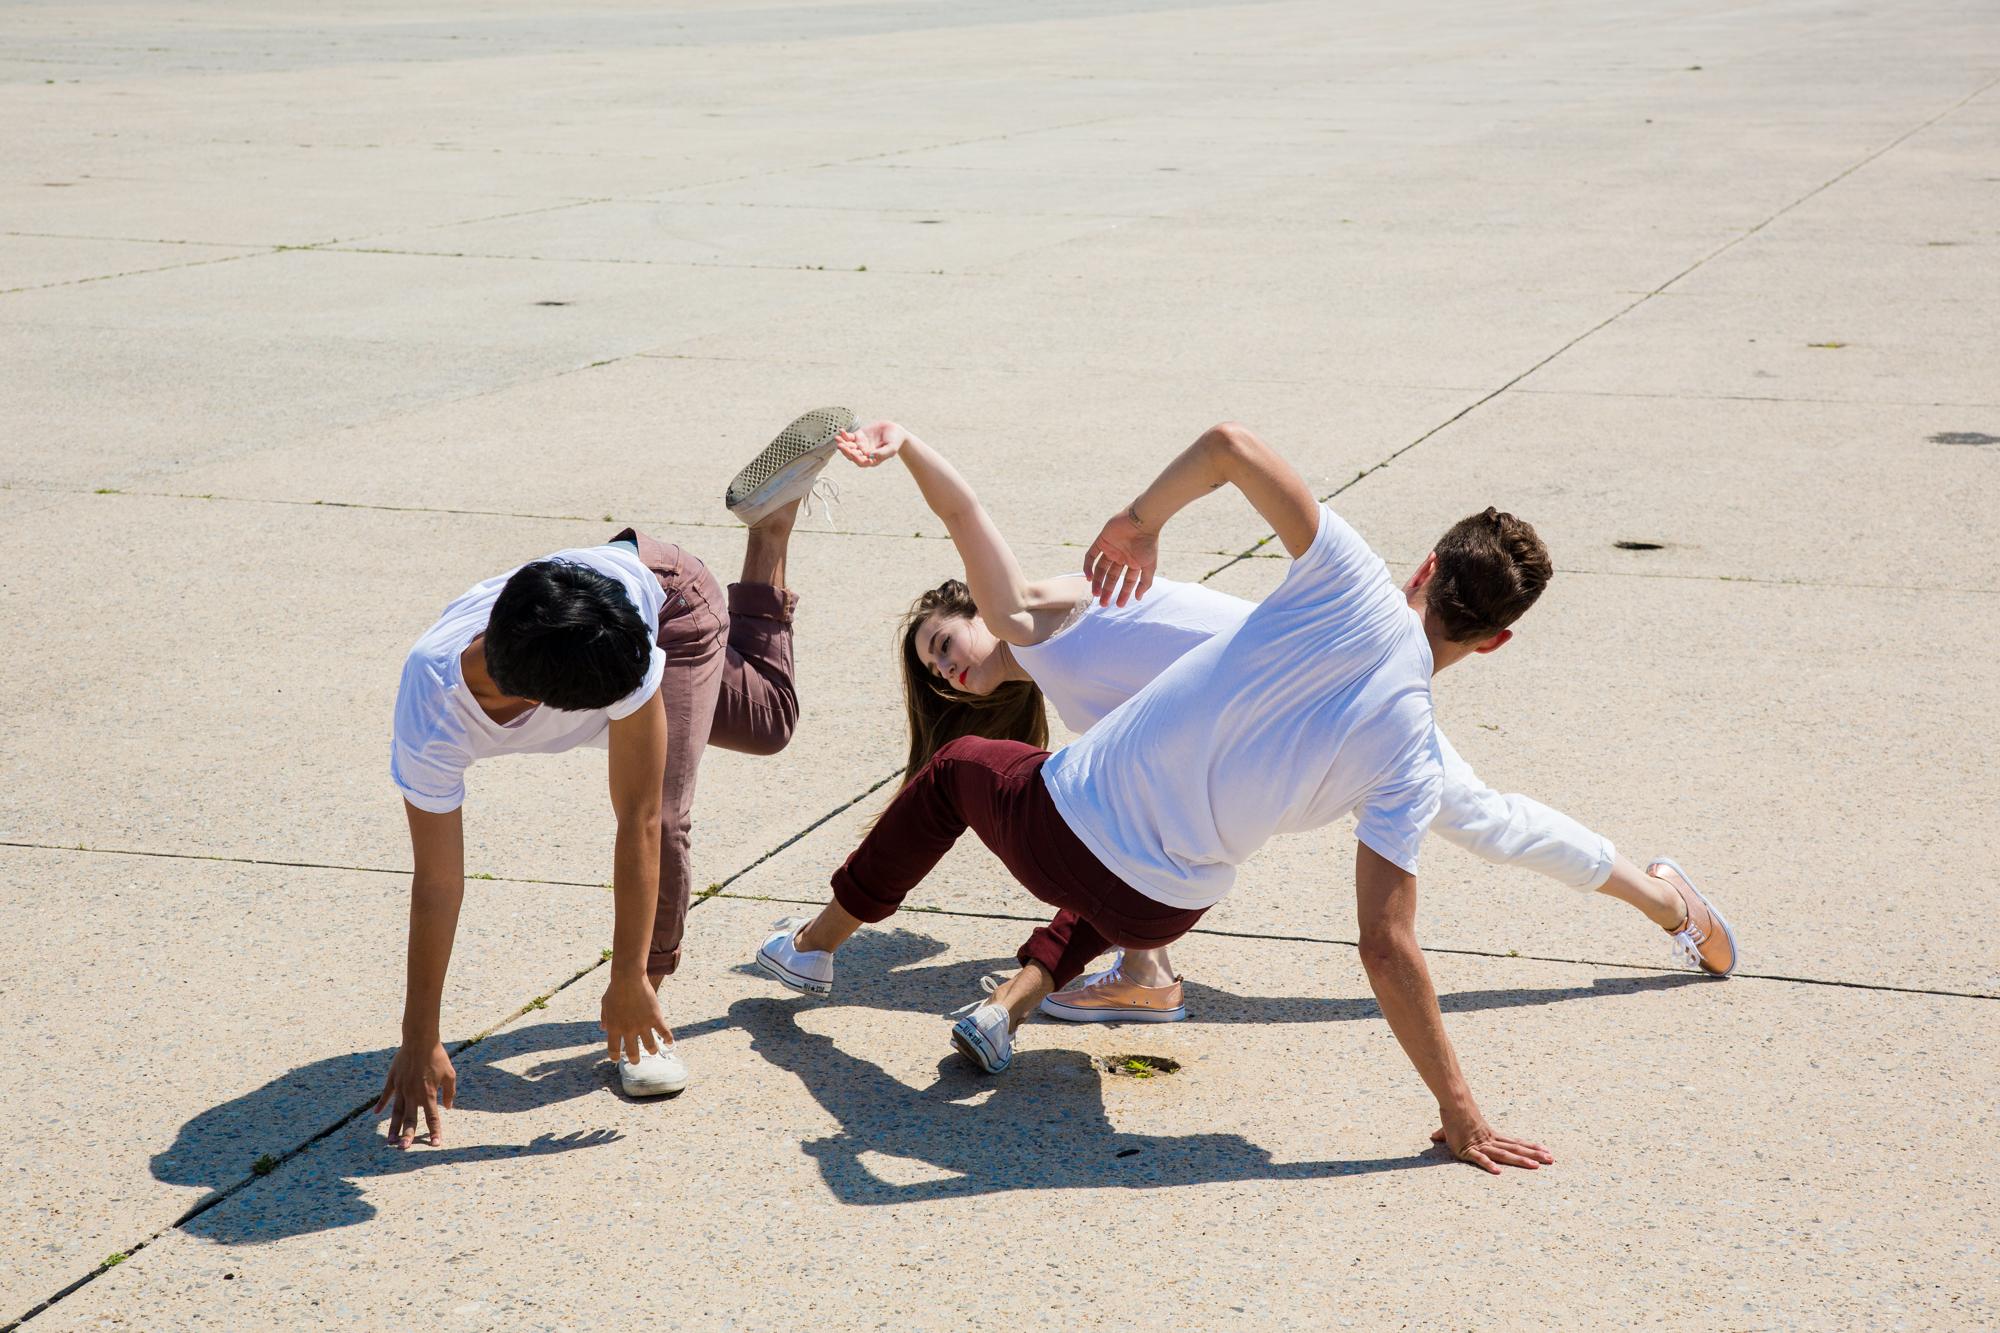 Rockaway Summer Dance Series_Photos by Daniel Terna_FIRST ROUGH SELECTS-15.jpg